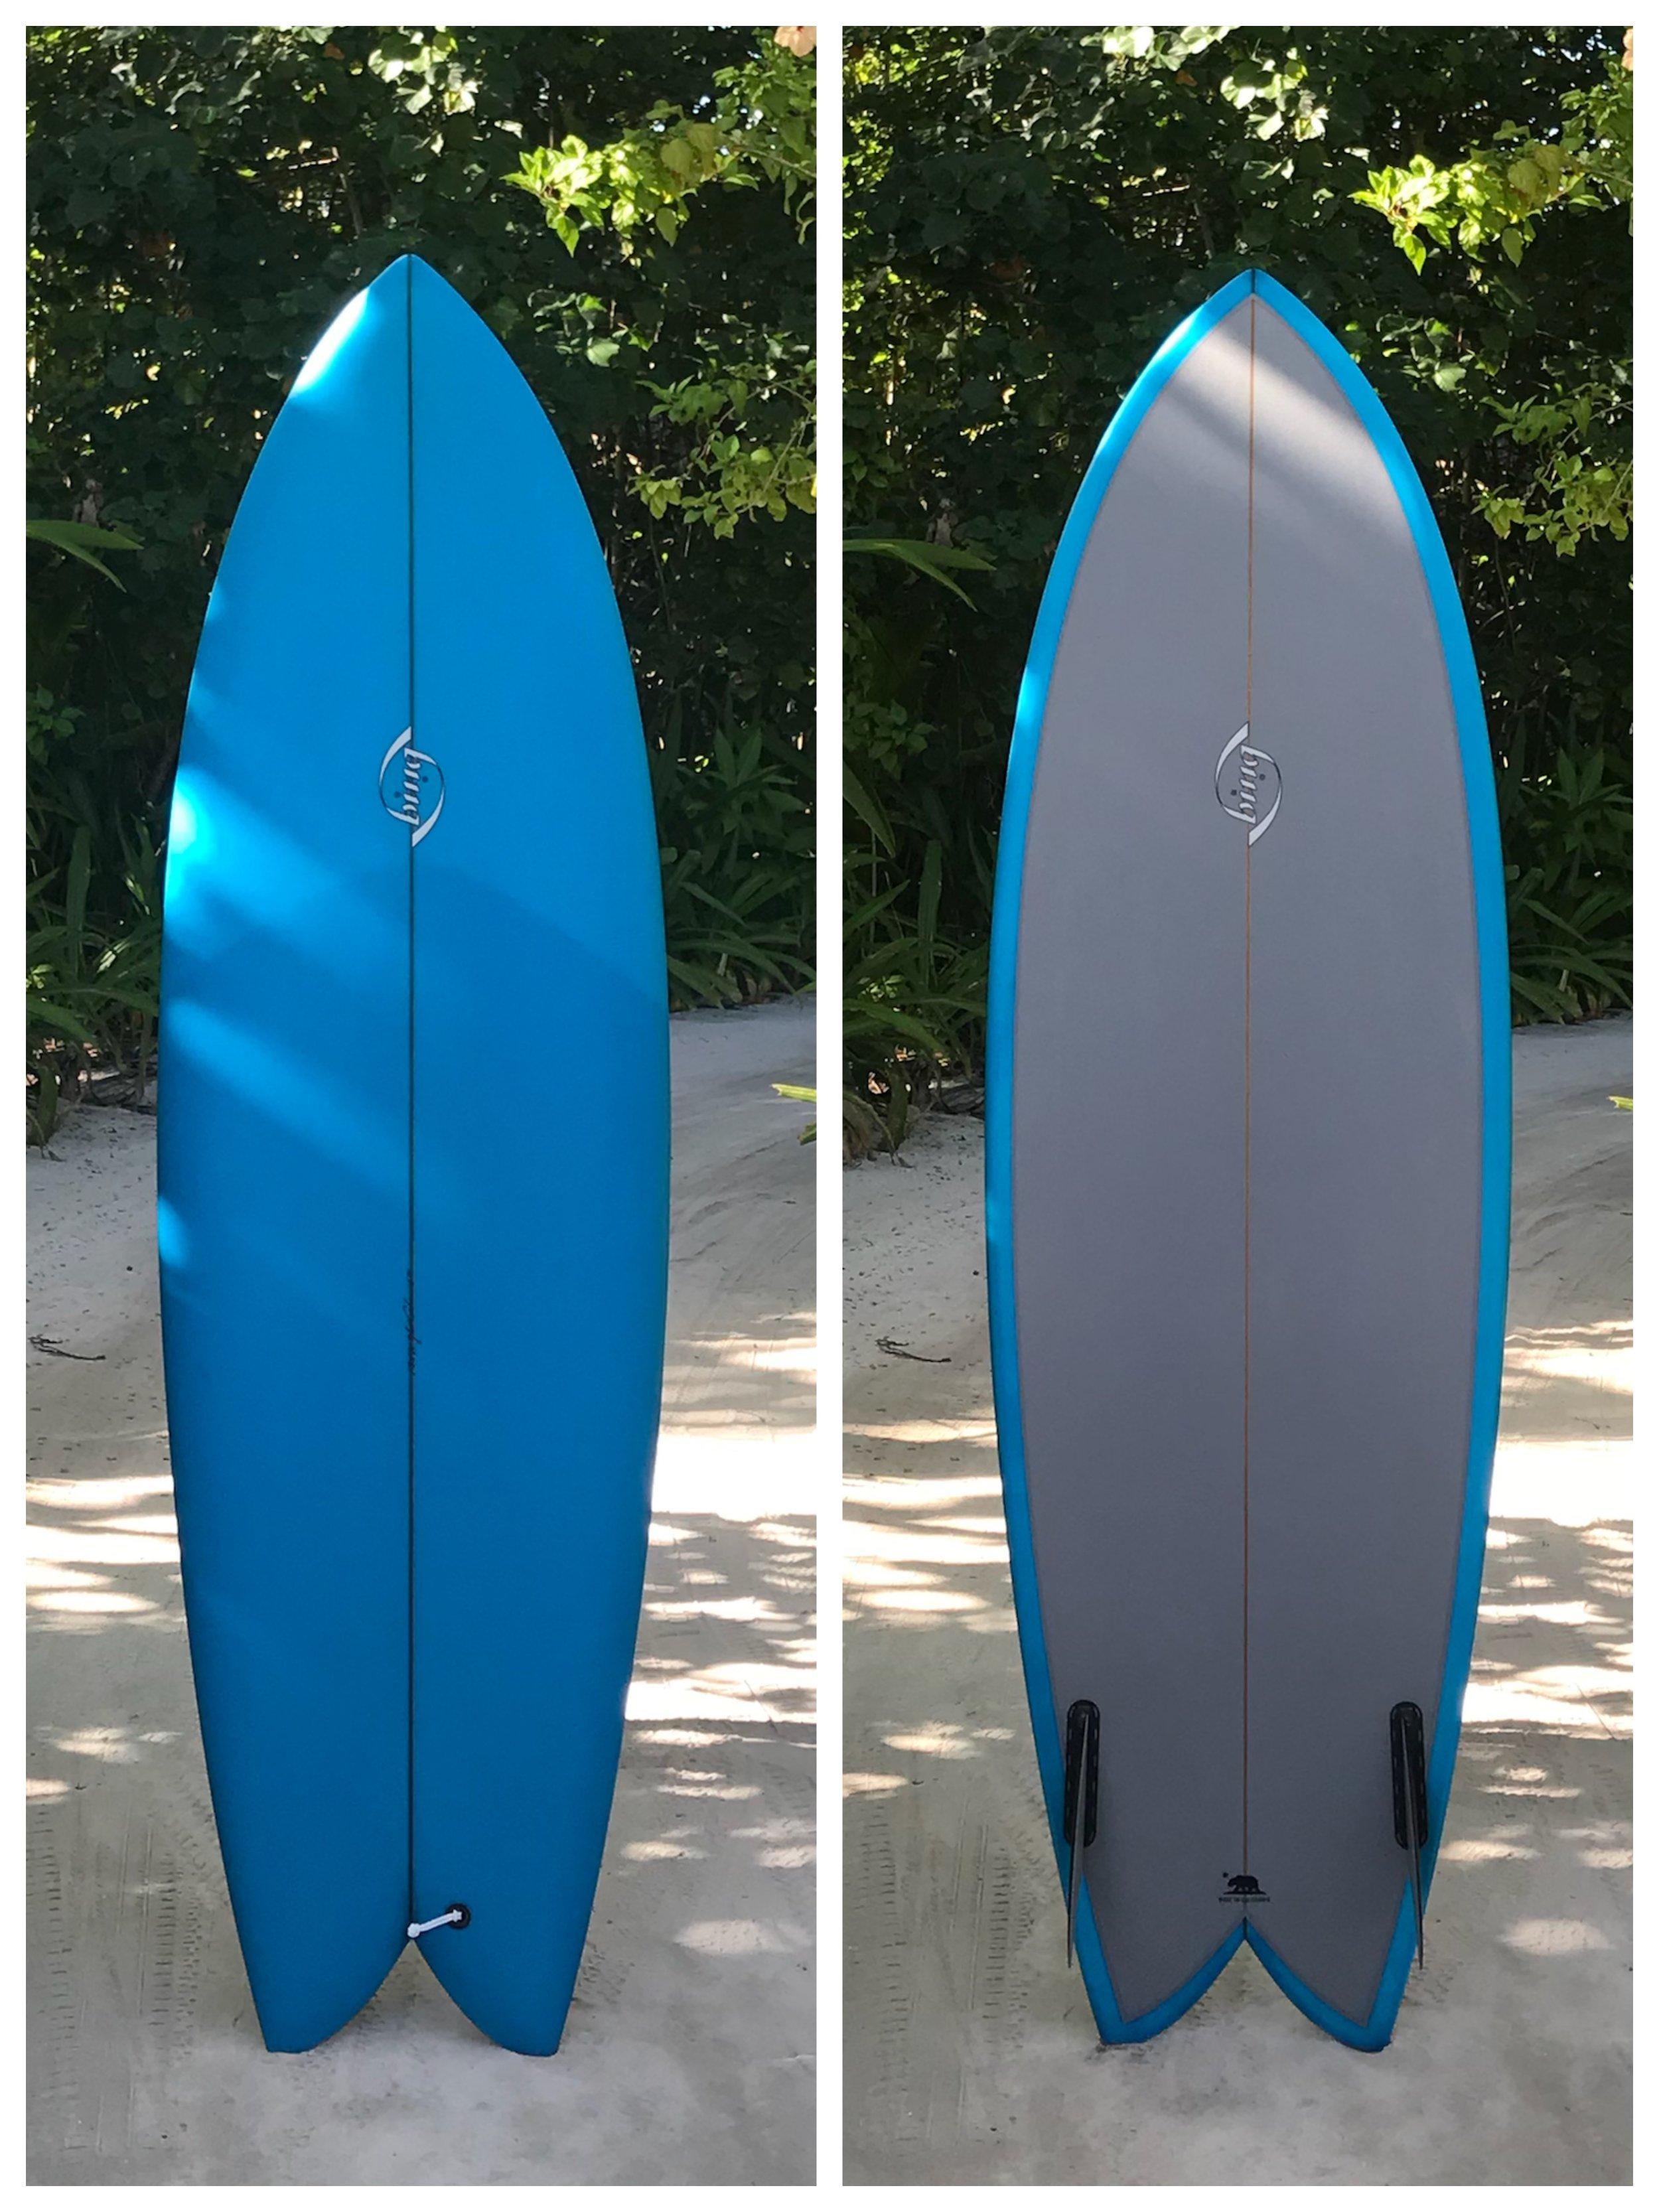 6'0 x 21.25 x 2.75 (36.8L) Bing Sunfish